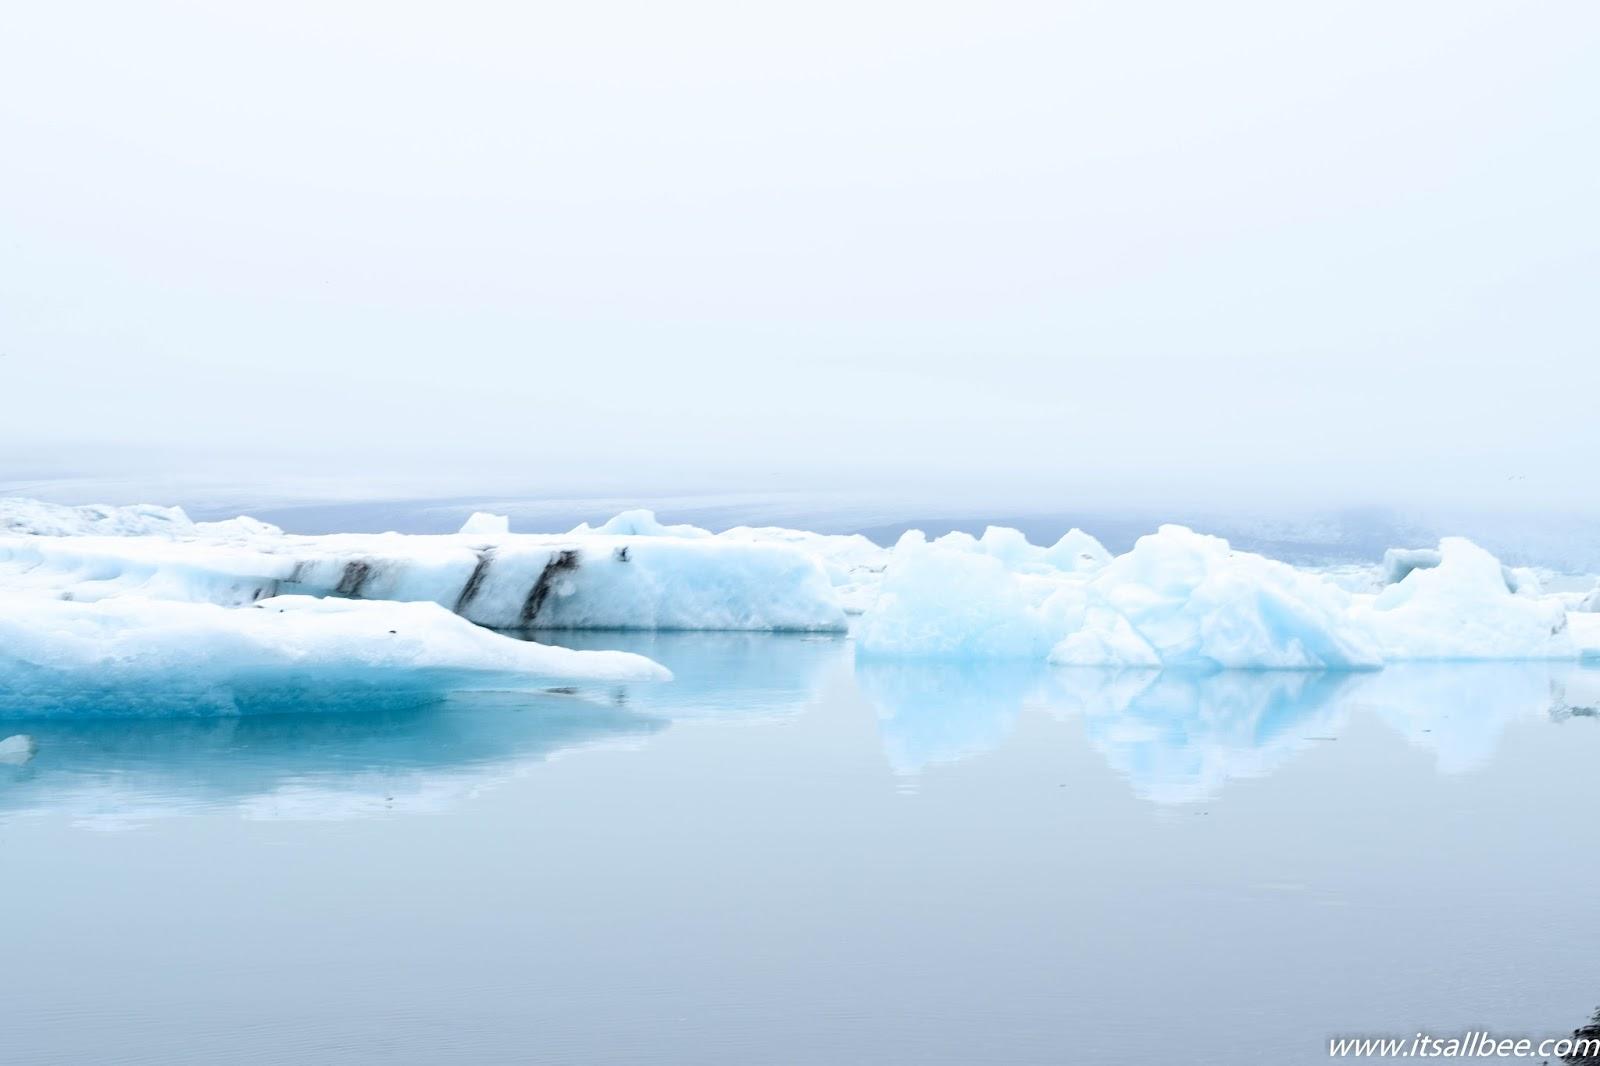 Jokulsarlon Glacier Lagoon Boat Tours | Visiting Iceland's Glacier Lagoon